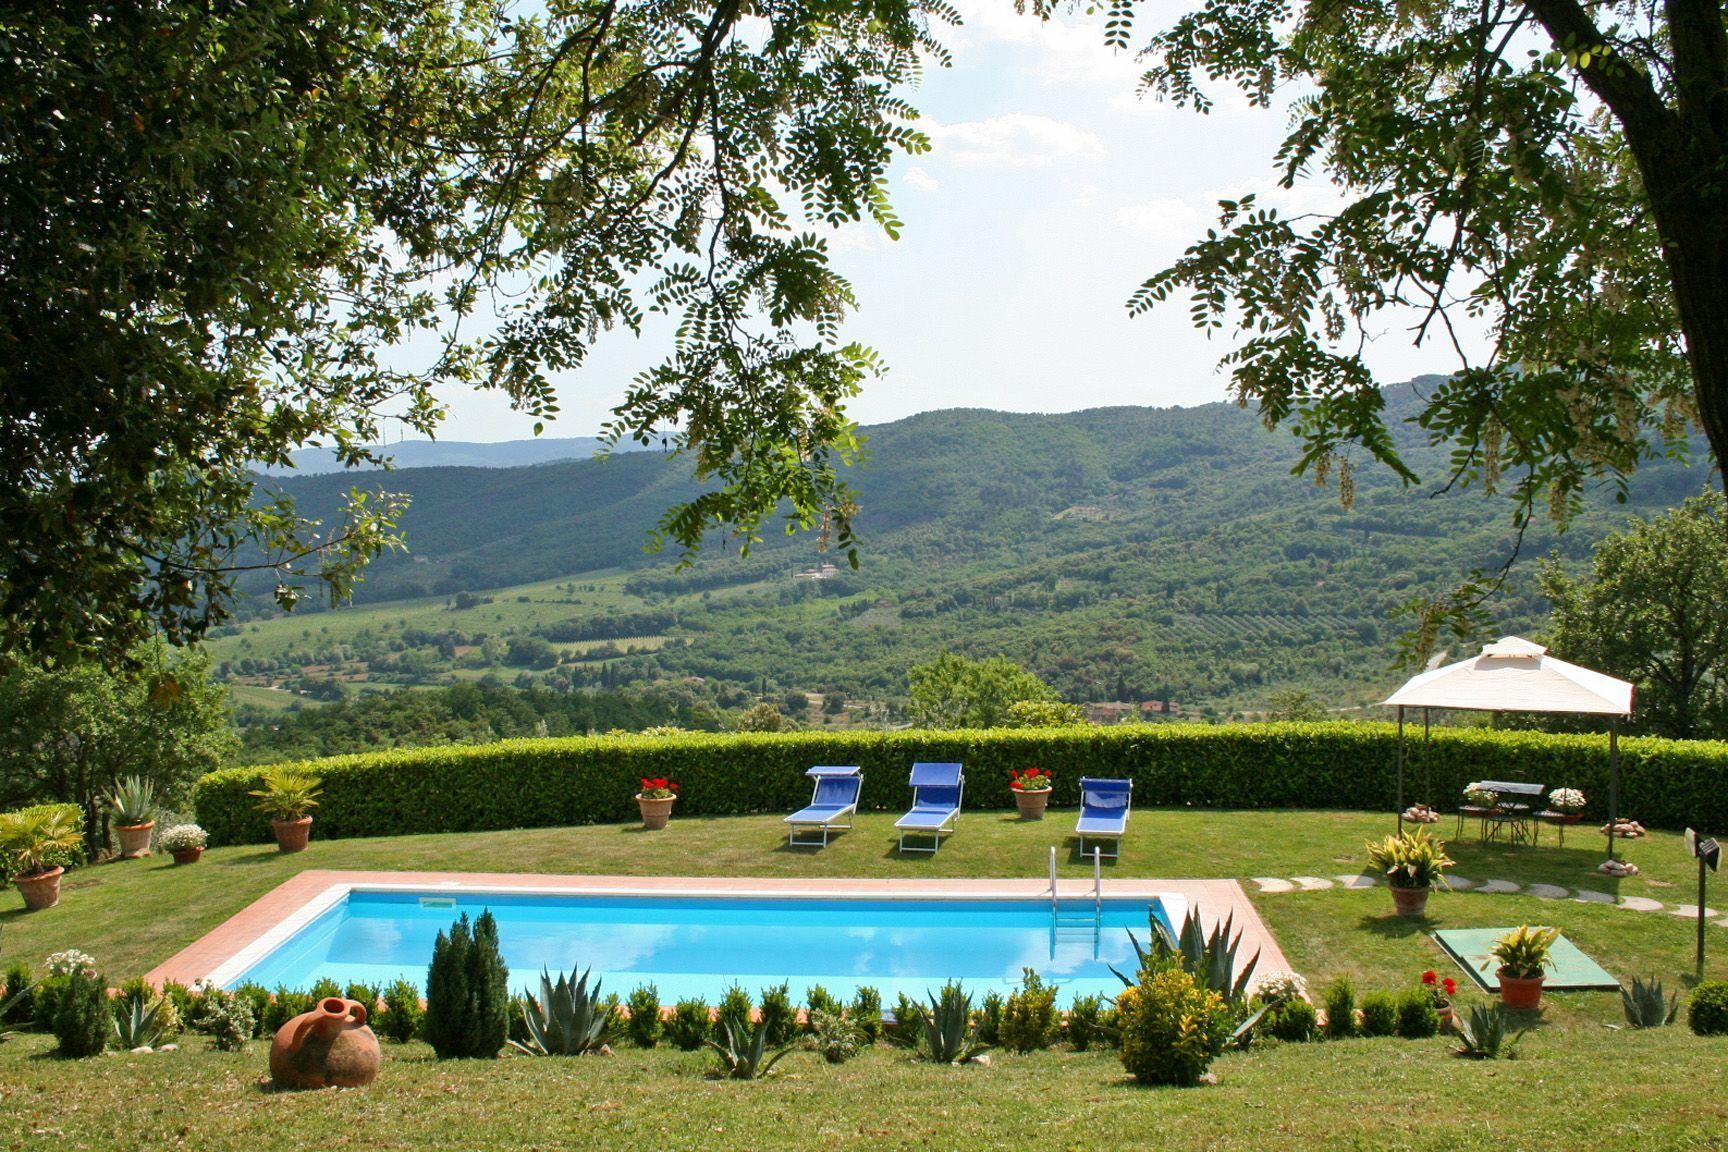 Foto Di Piscine Private villa crispinino: vacation rental that sleeps 9 people in 4